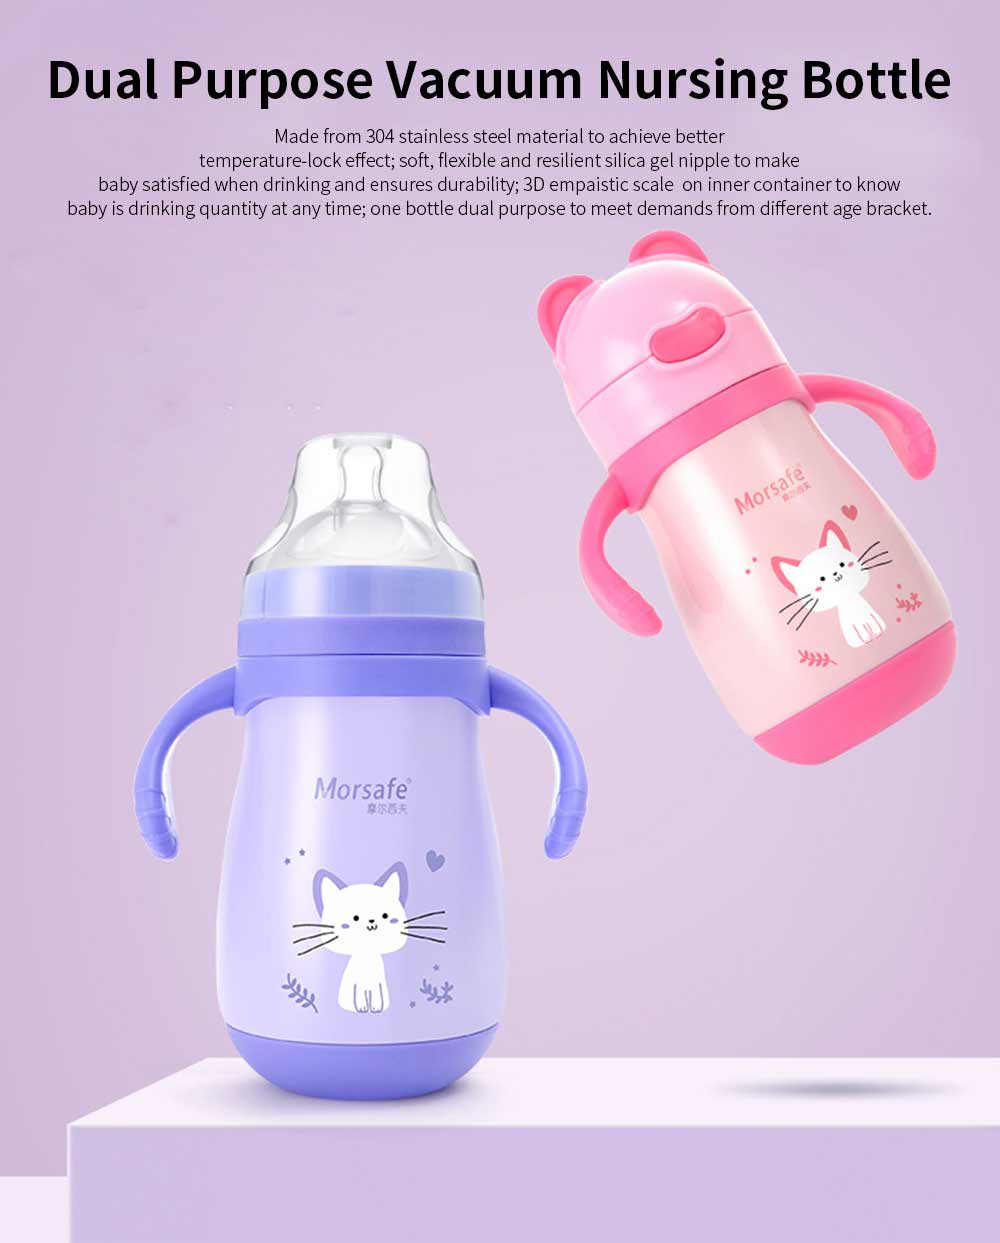 Vacuum Nursing Bottle for Children Feeding 260ml Dual Purpose Feeding Bottle, Stainless Steel Vacuum Cup Feeder Wholesale Nursery 0